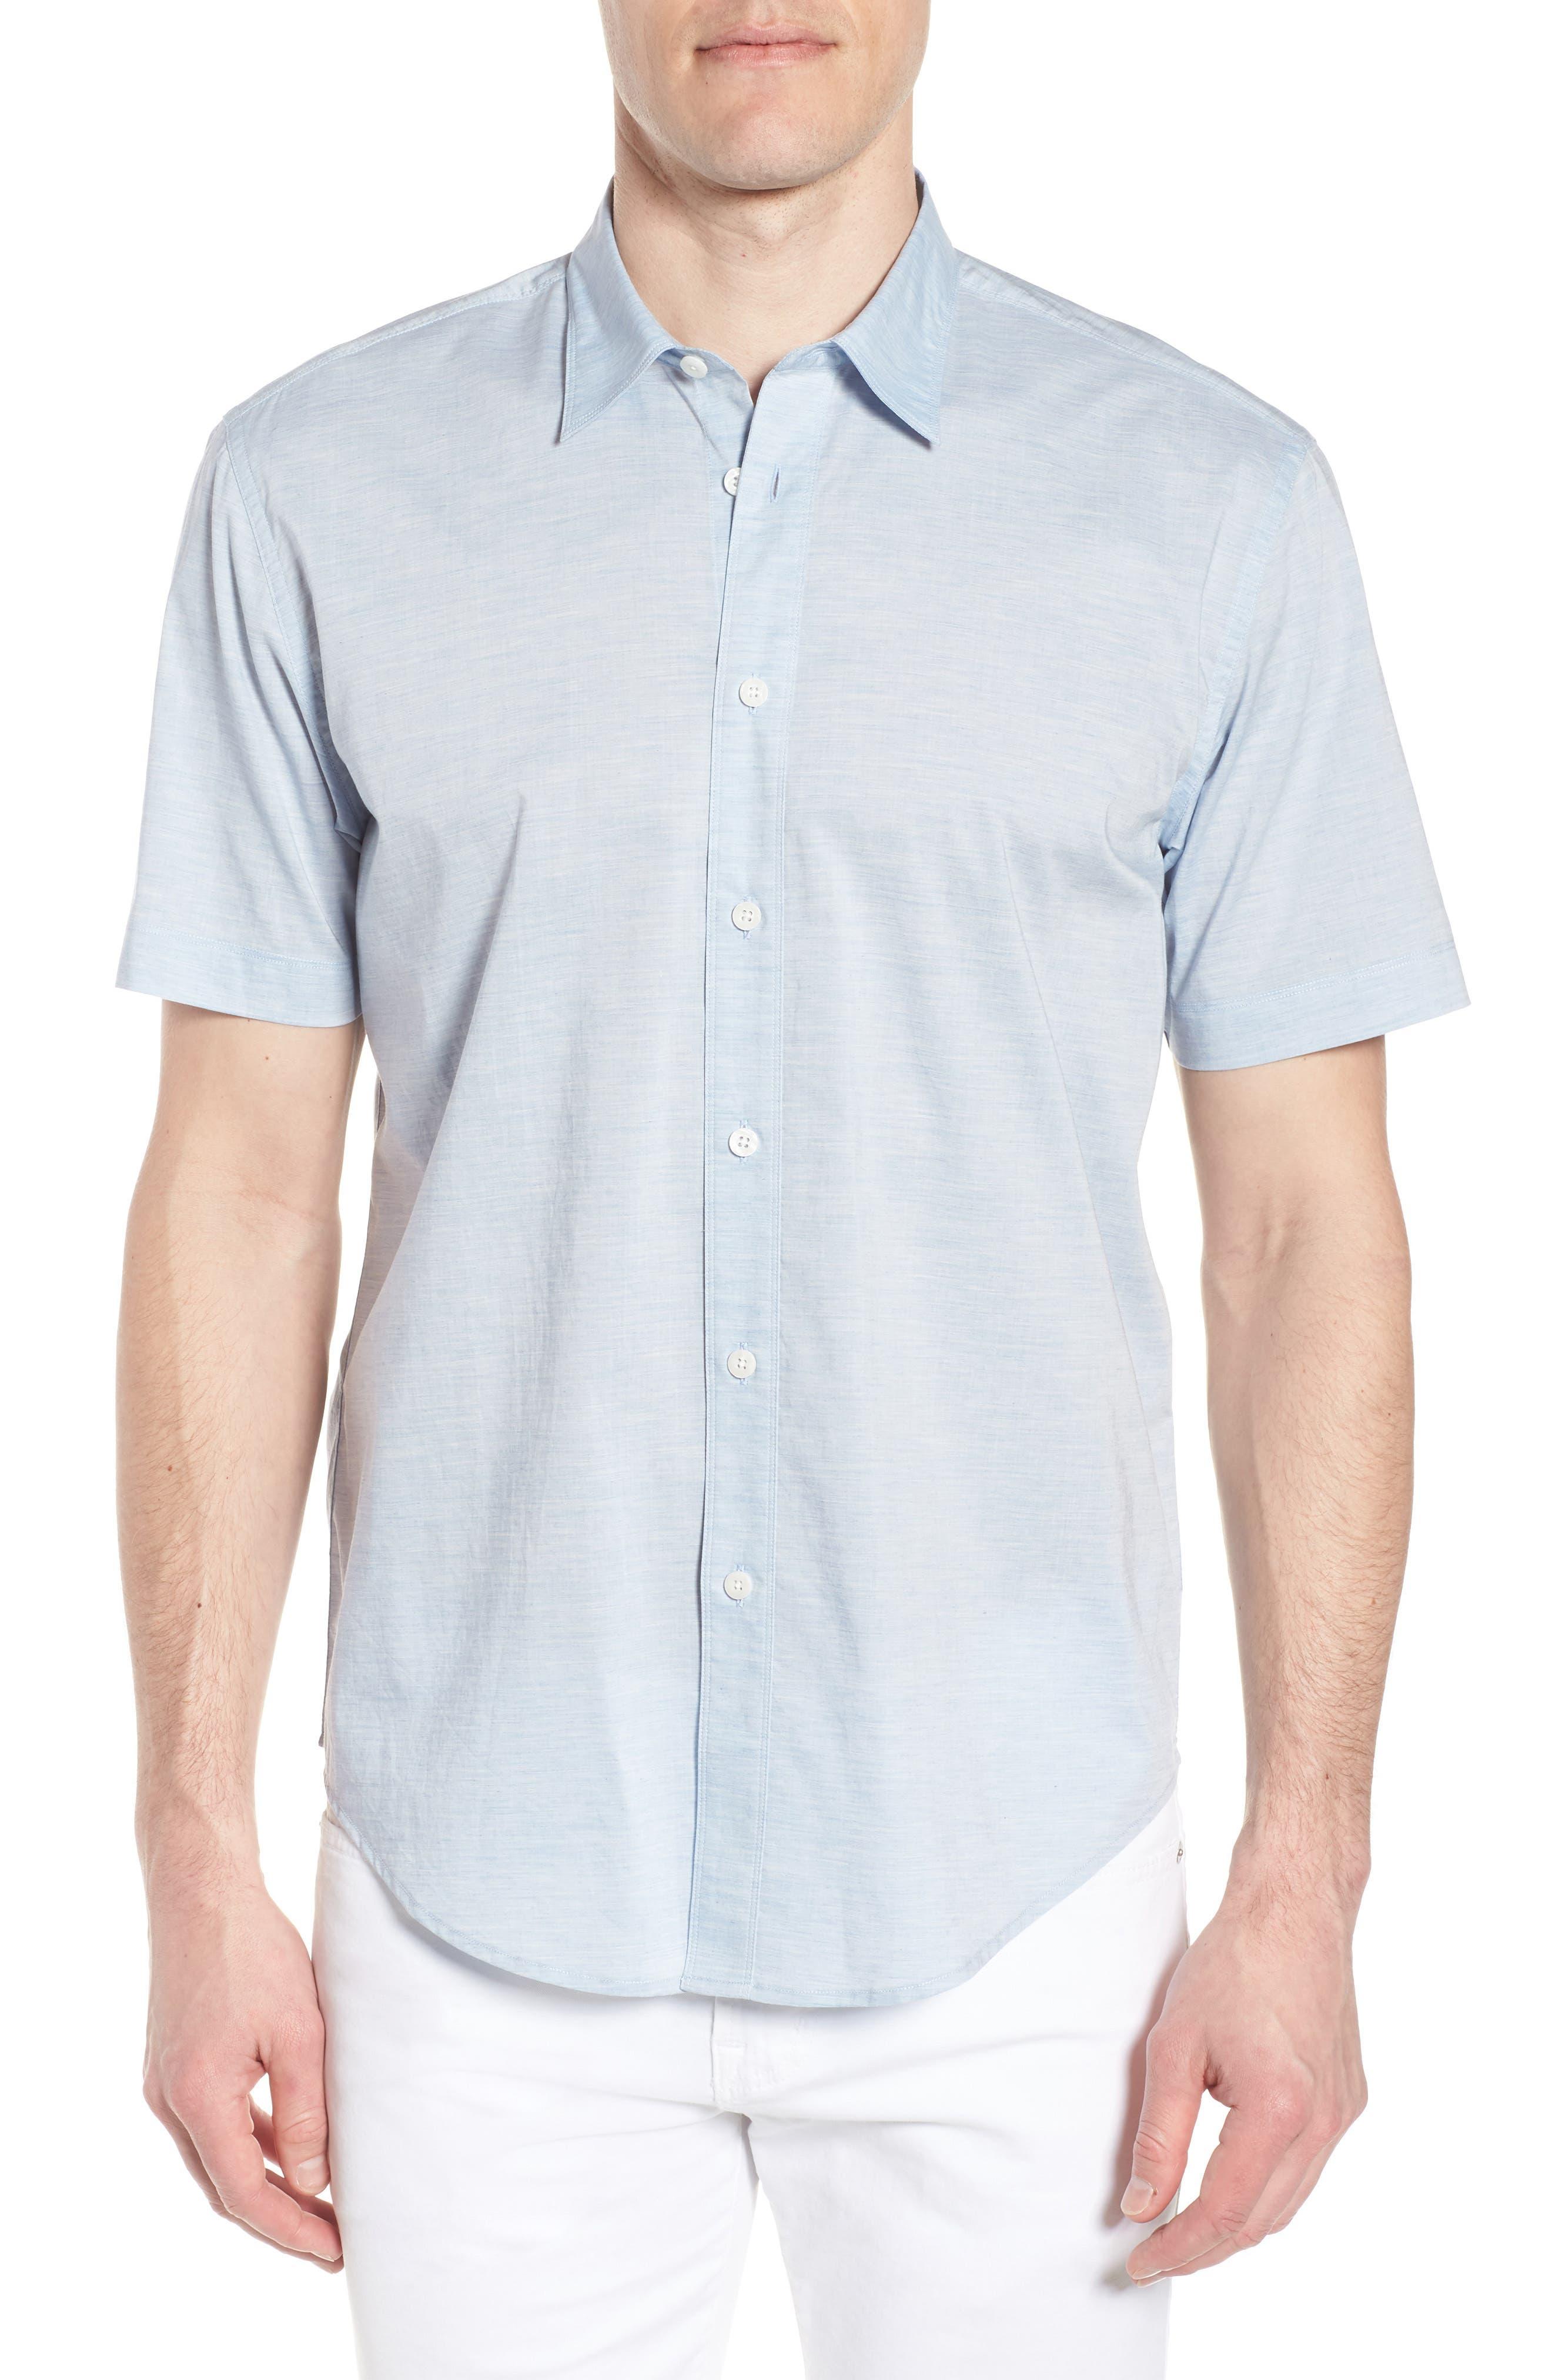 Solana Regular Fit Short Sleeve Sport Shirt,                             Main thumbnail 1, color,                             Blue